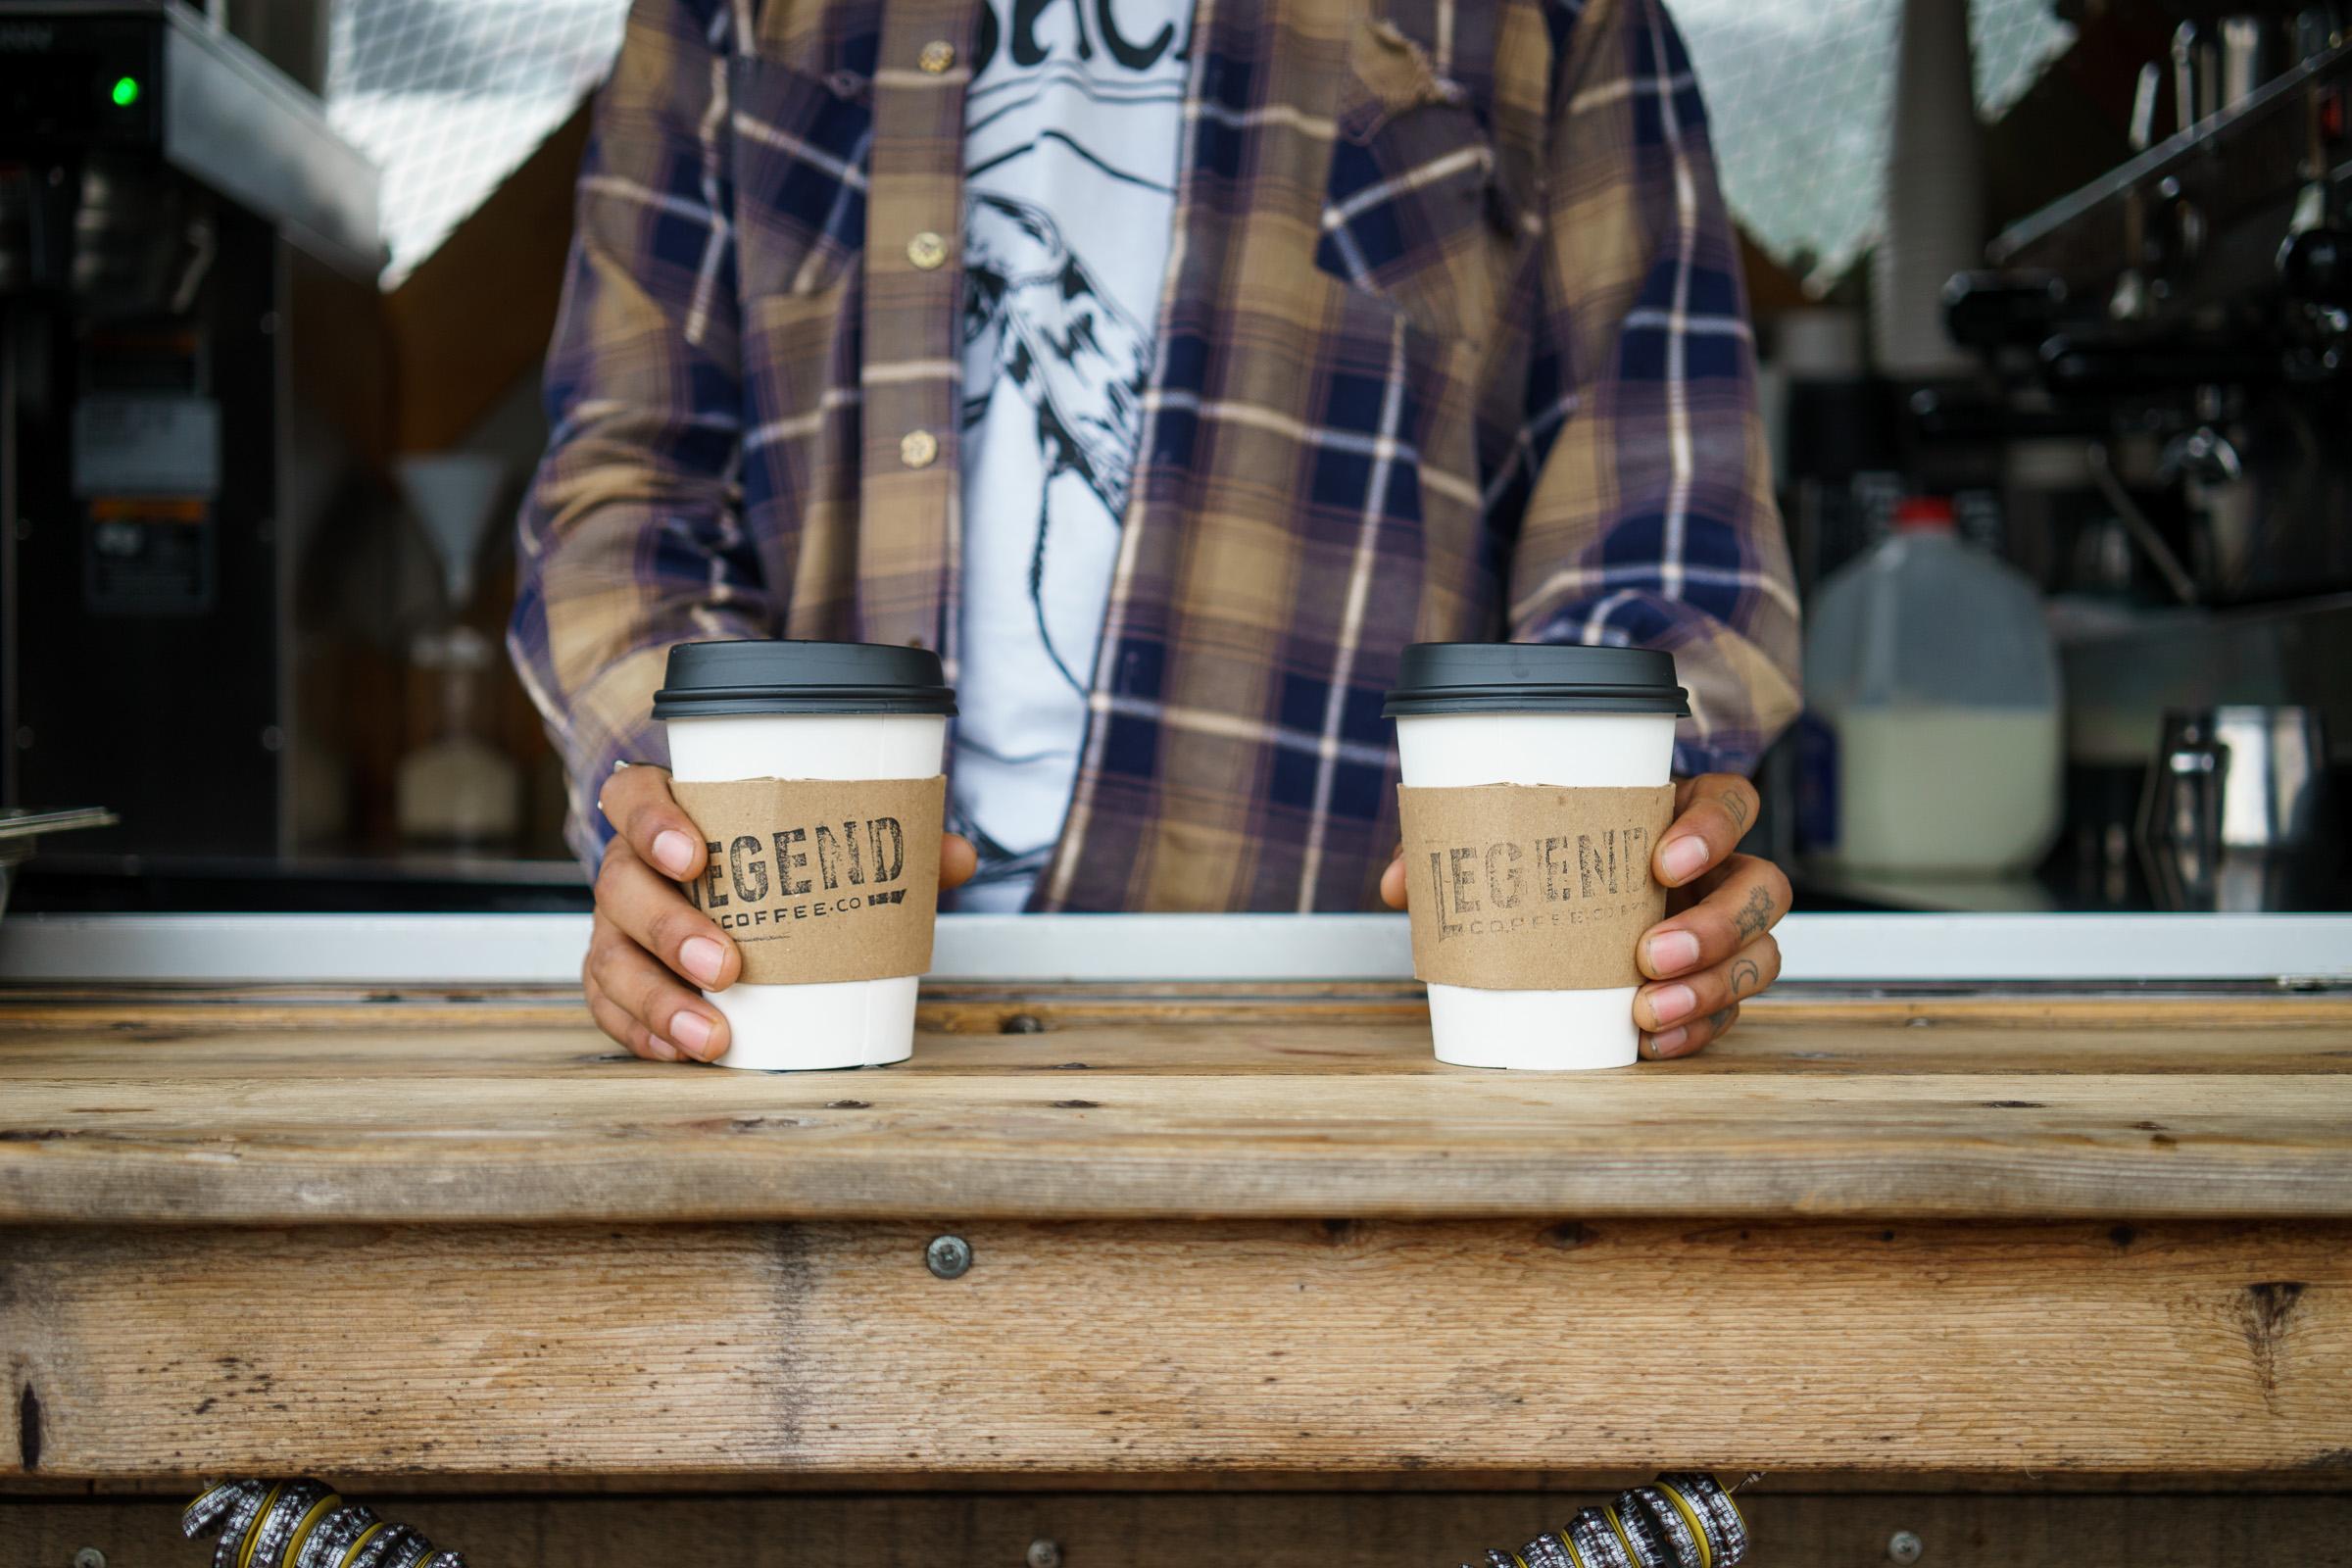 travel channel austin texas food photographer portland oregon legend coffee